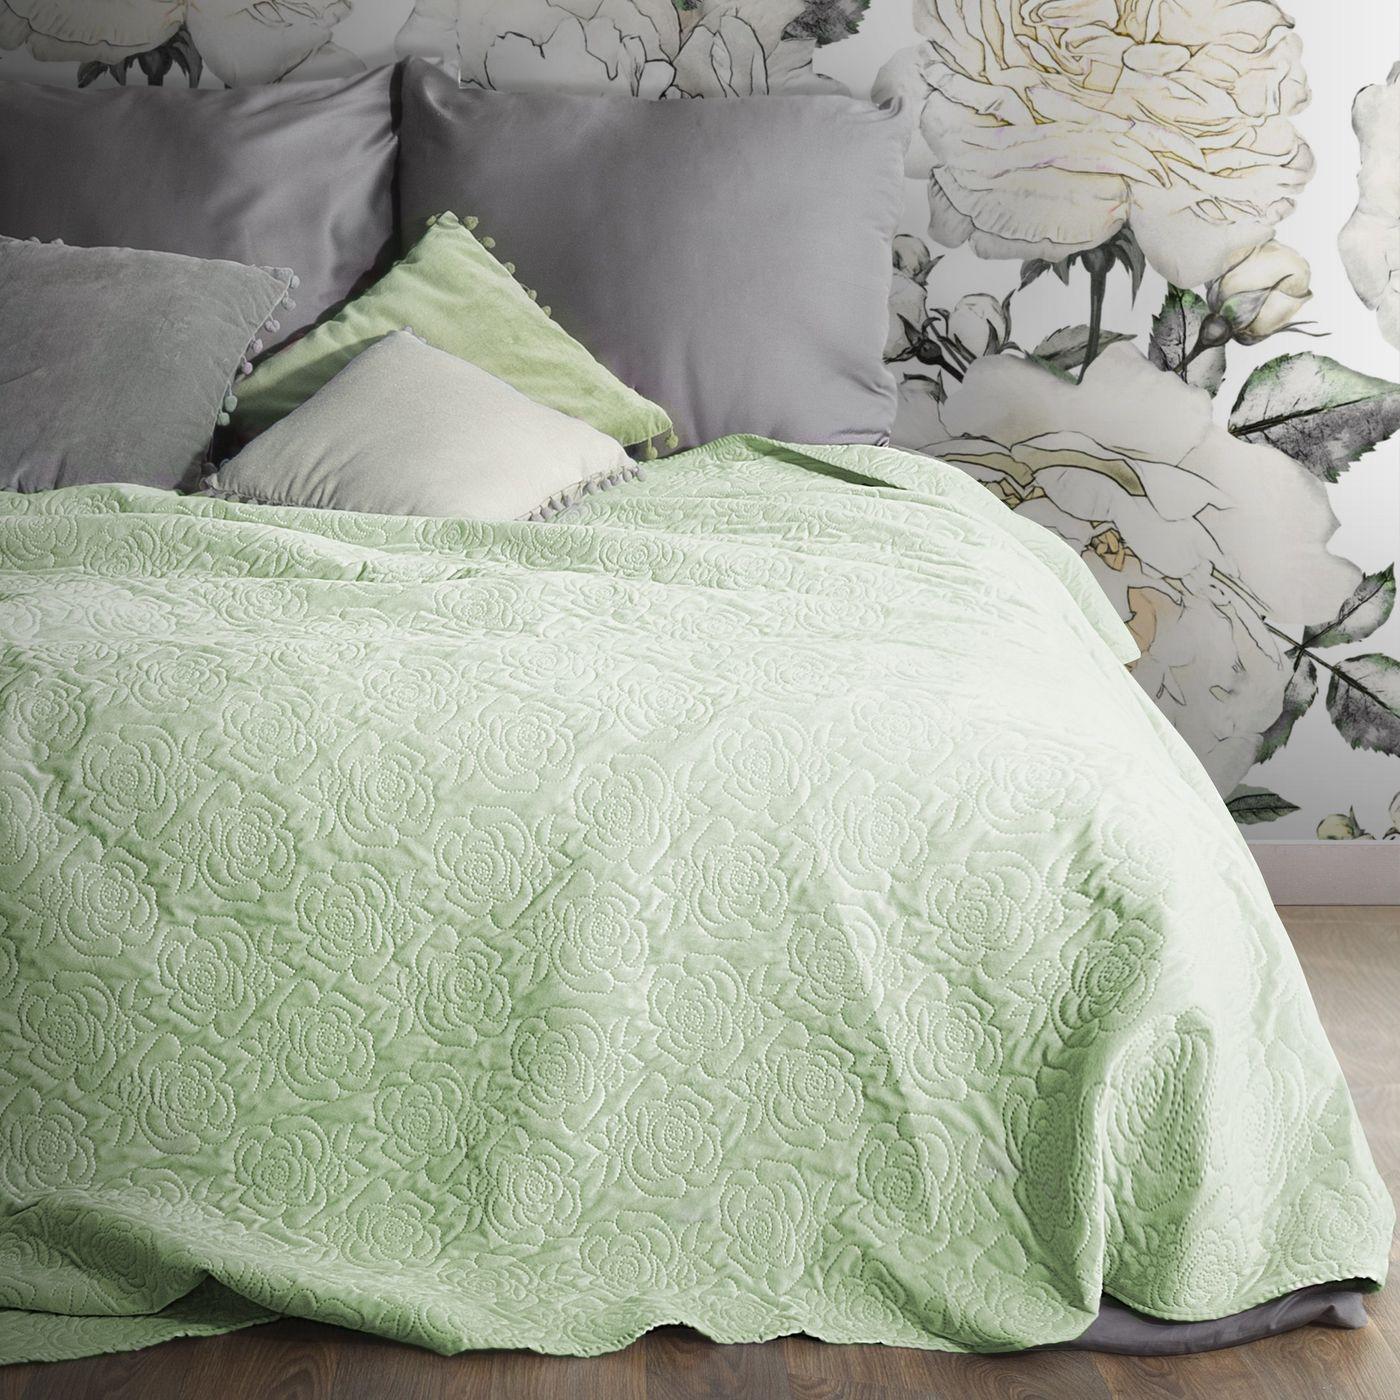 Narzuta melanie zielona pikowana 220x240 cm